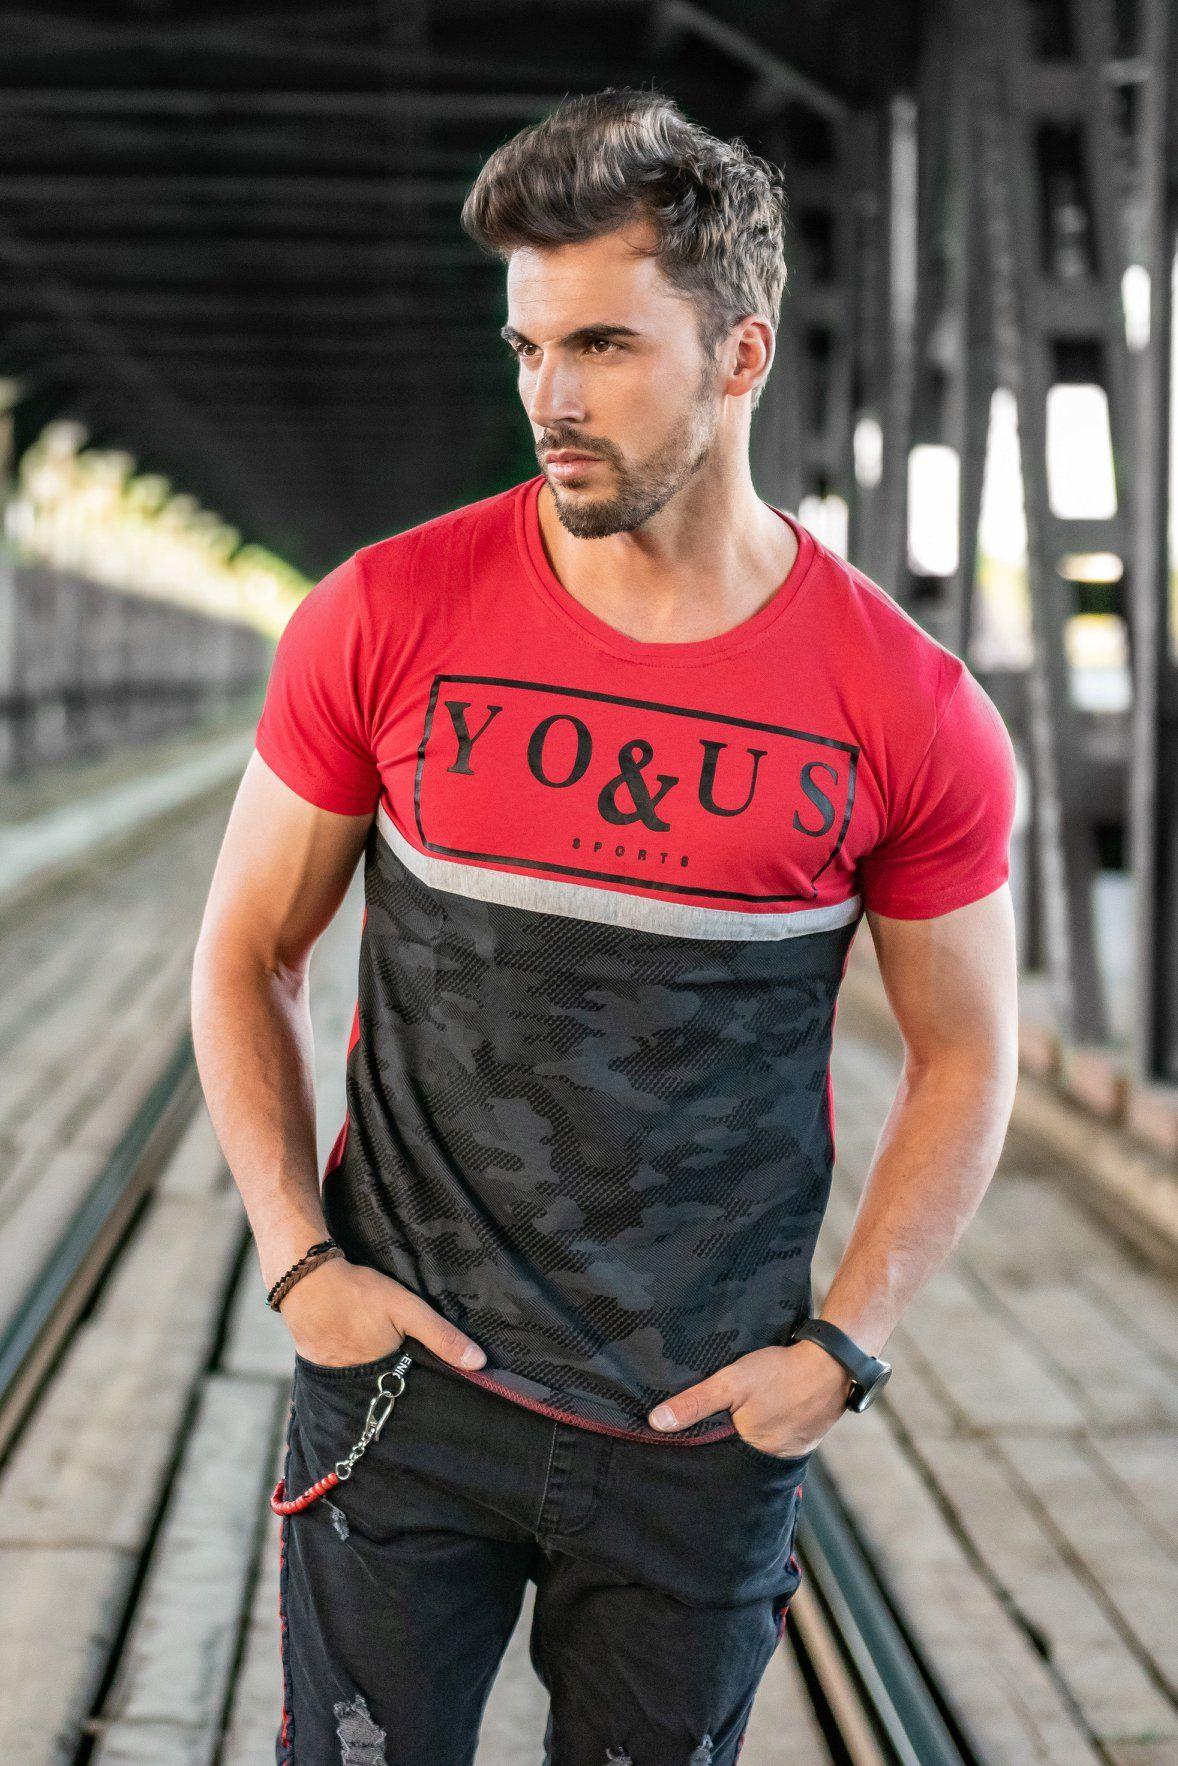 7bed882d5ce4f Mister Polski - Jakub Kucner i nasz look T-shirt 19